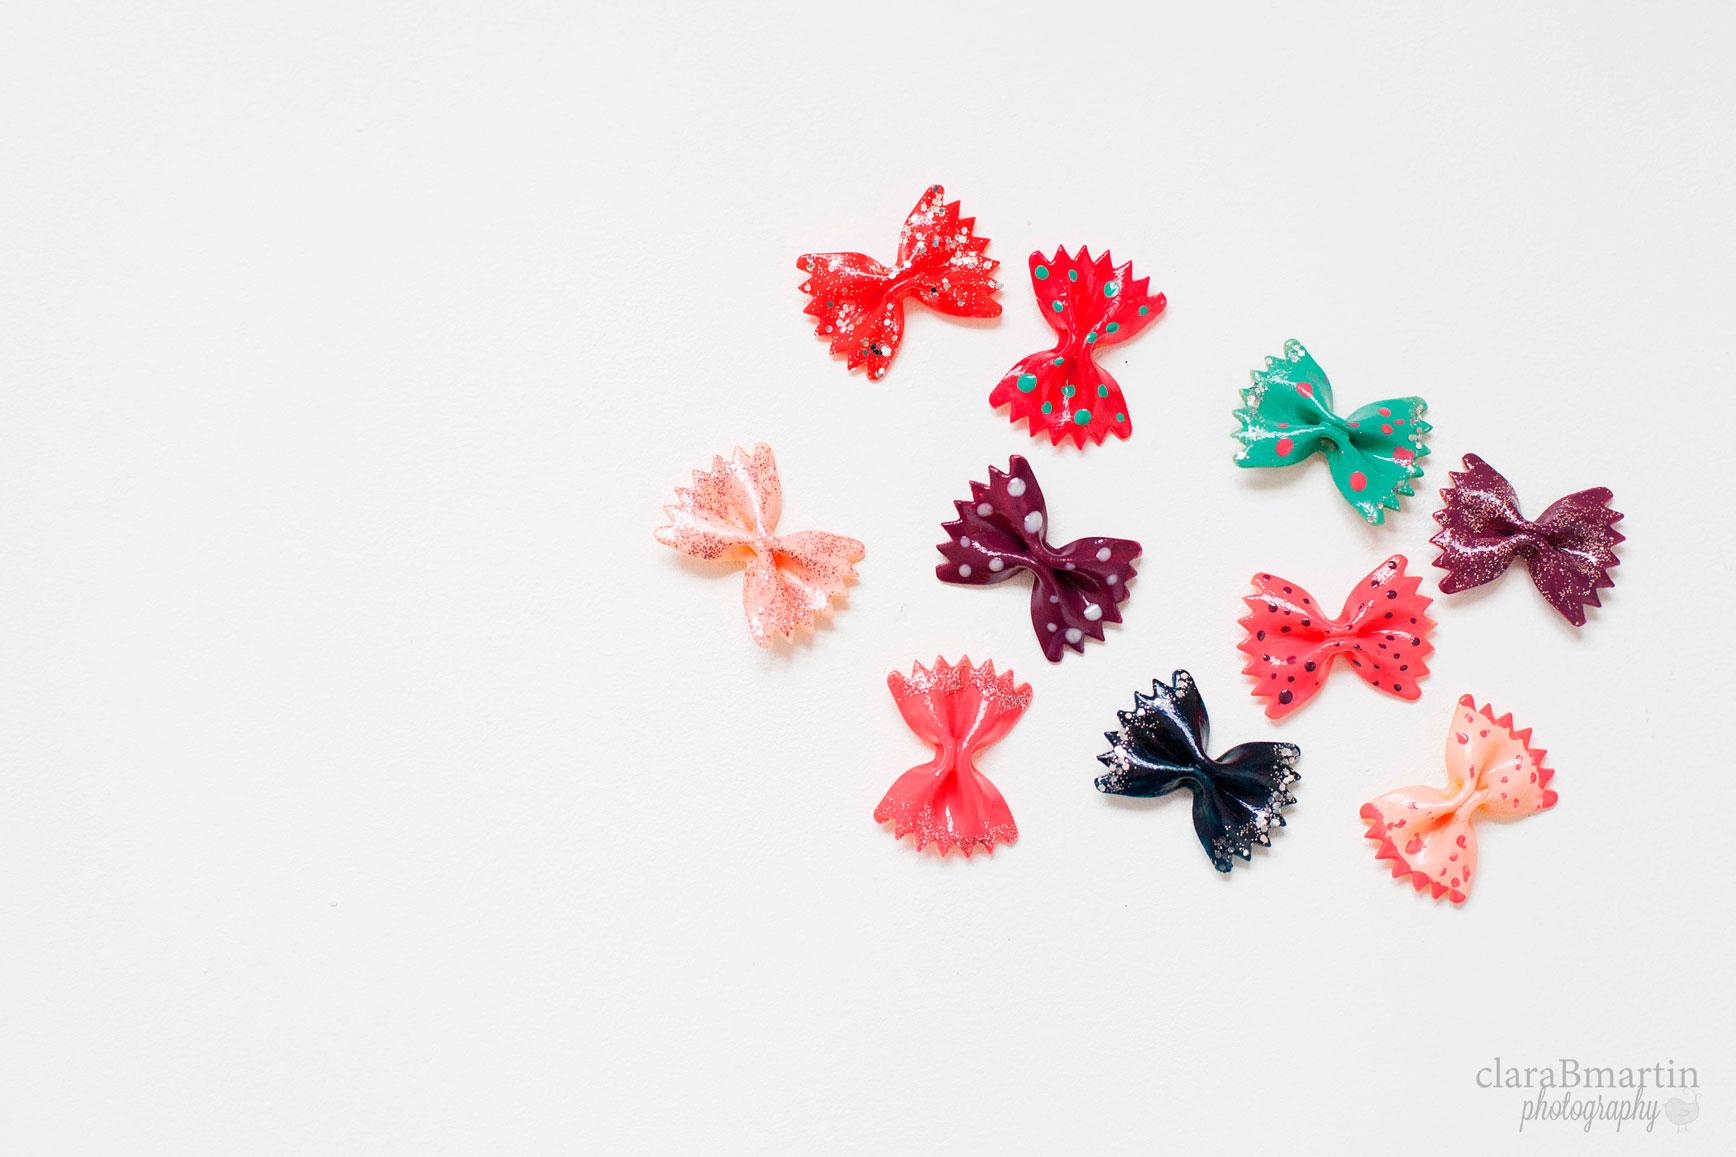 Lace Rings DIY_claraBmartin07